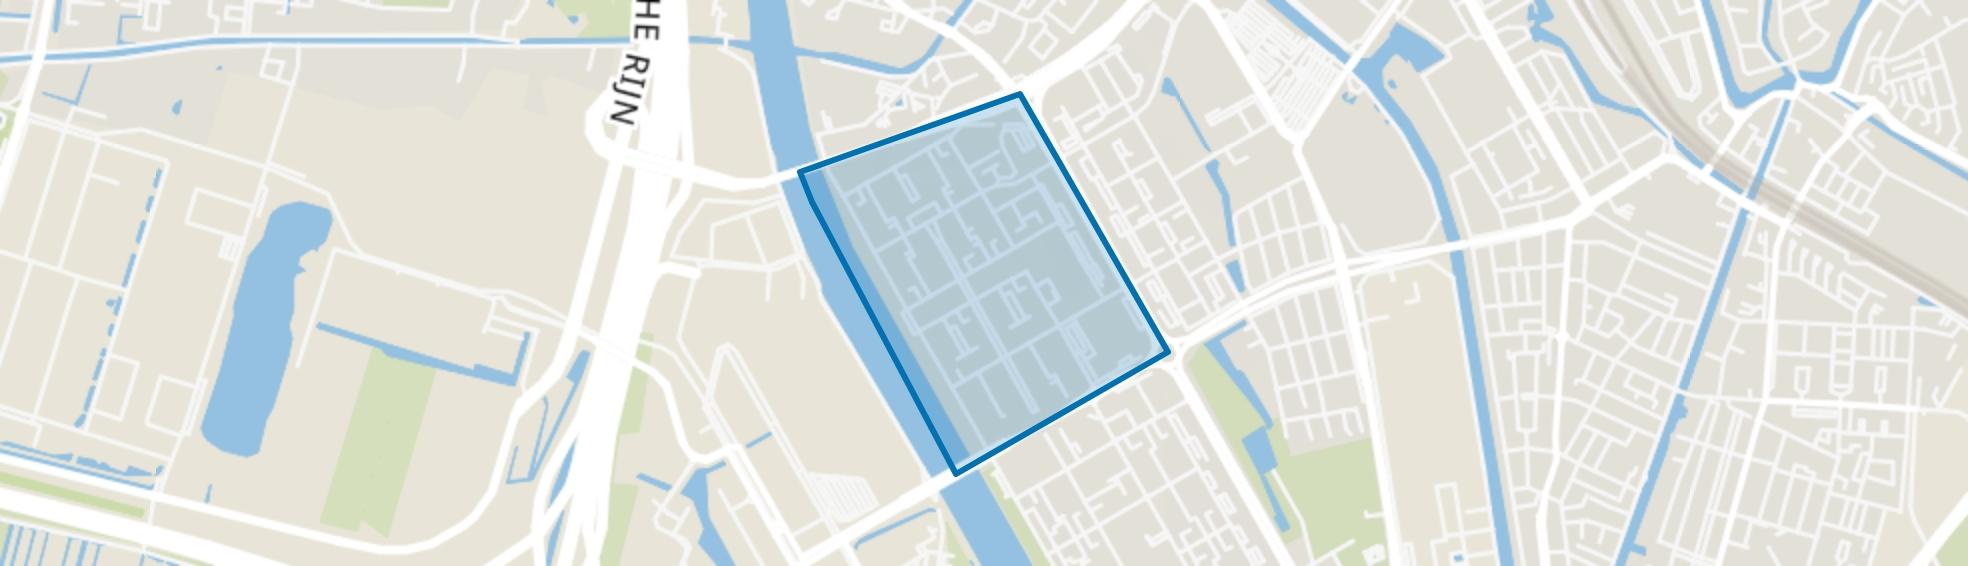 Kanaleneiland-Noord, Utrecht map